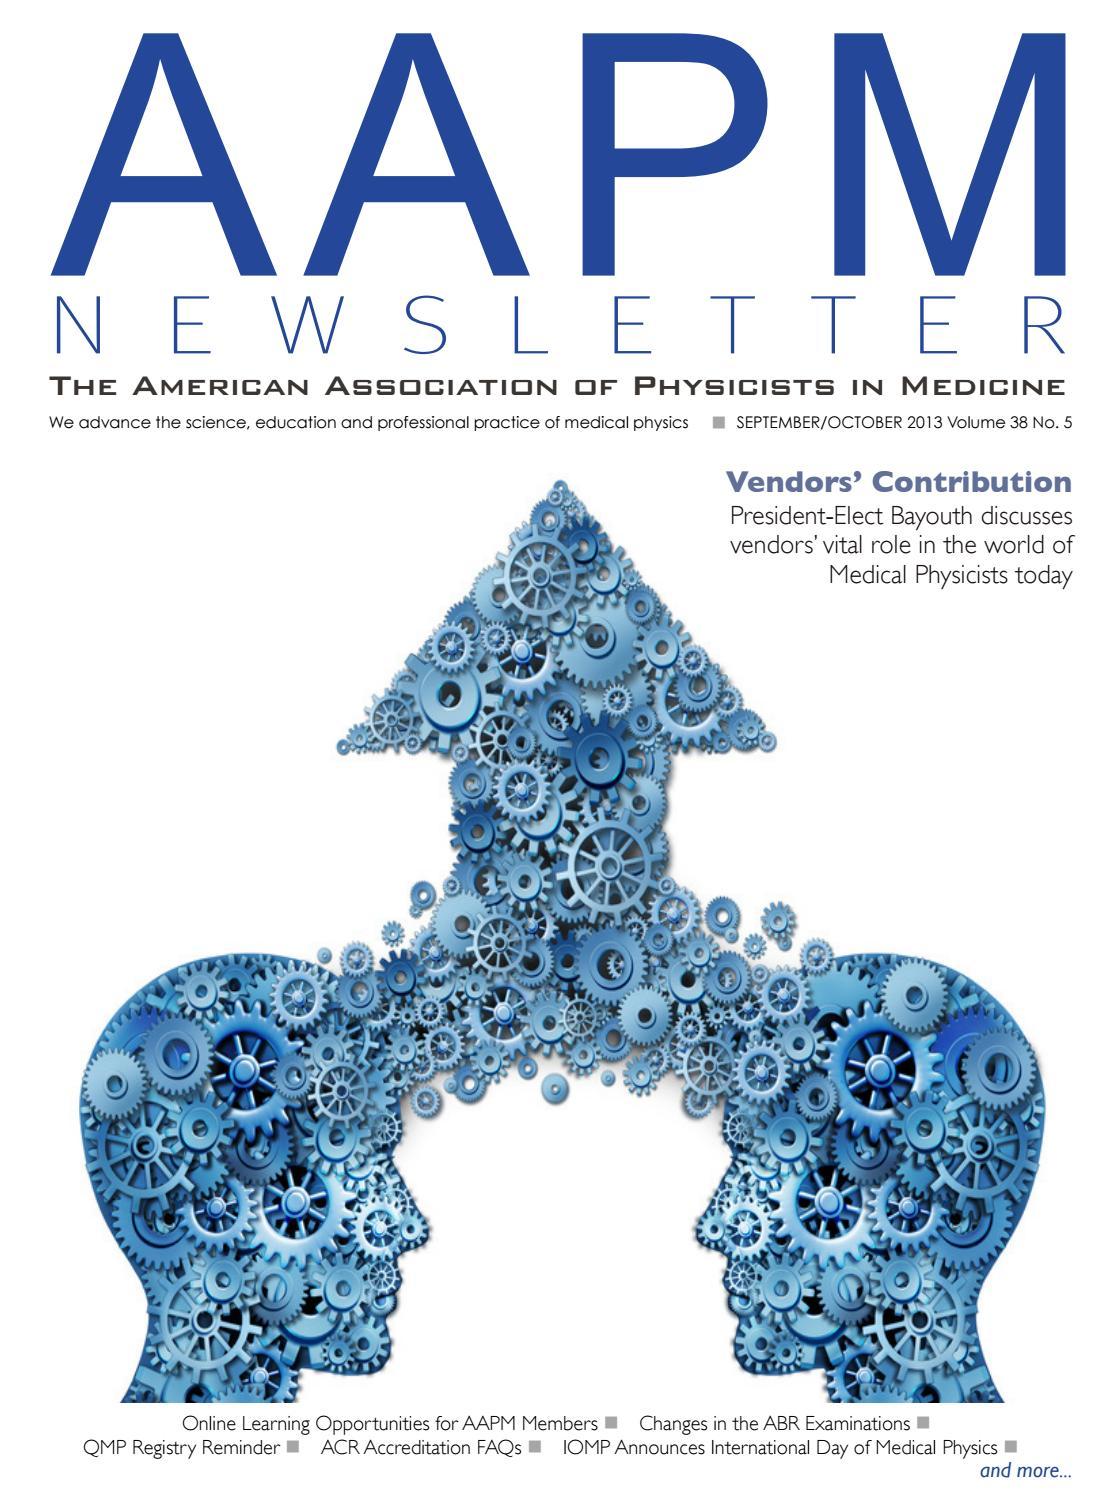 AAPM Newsletter September/October 2013 Vol  38 No  5 by aapmdocs - issuu